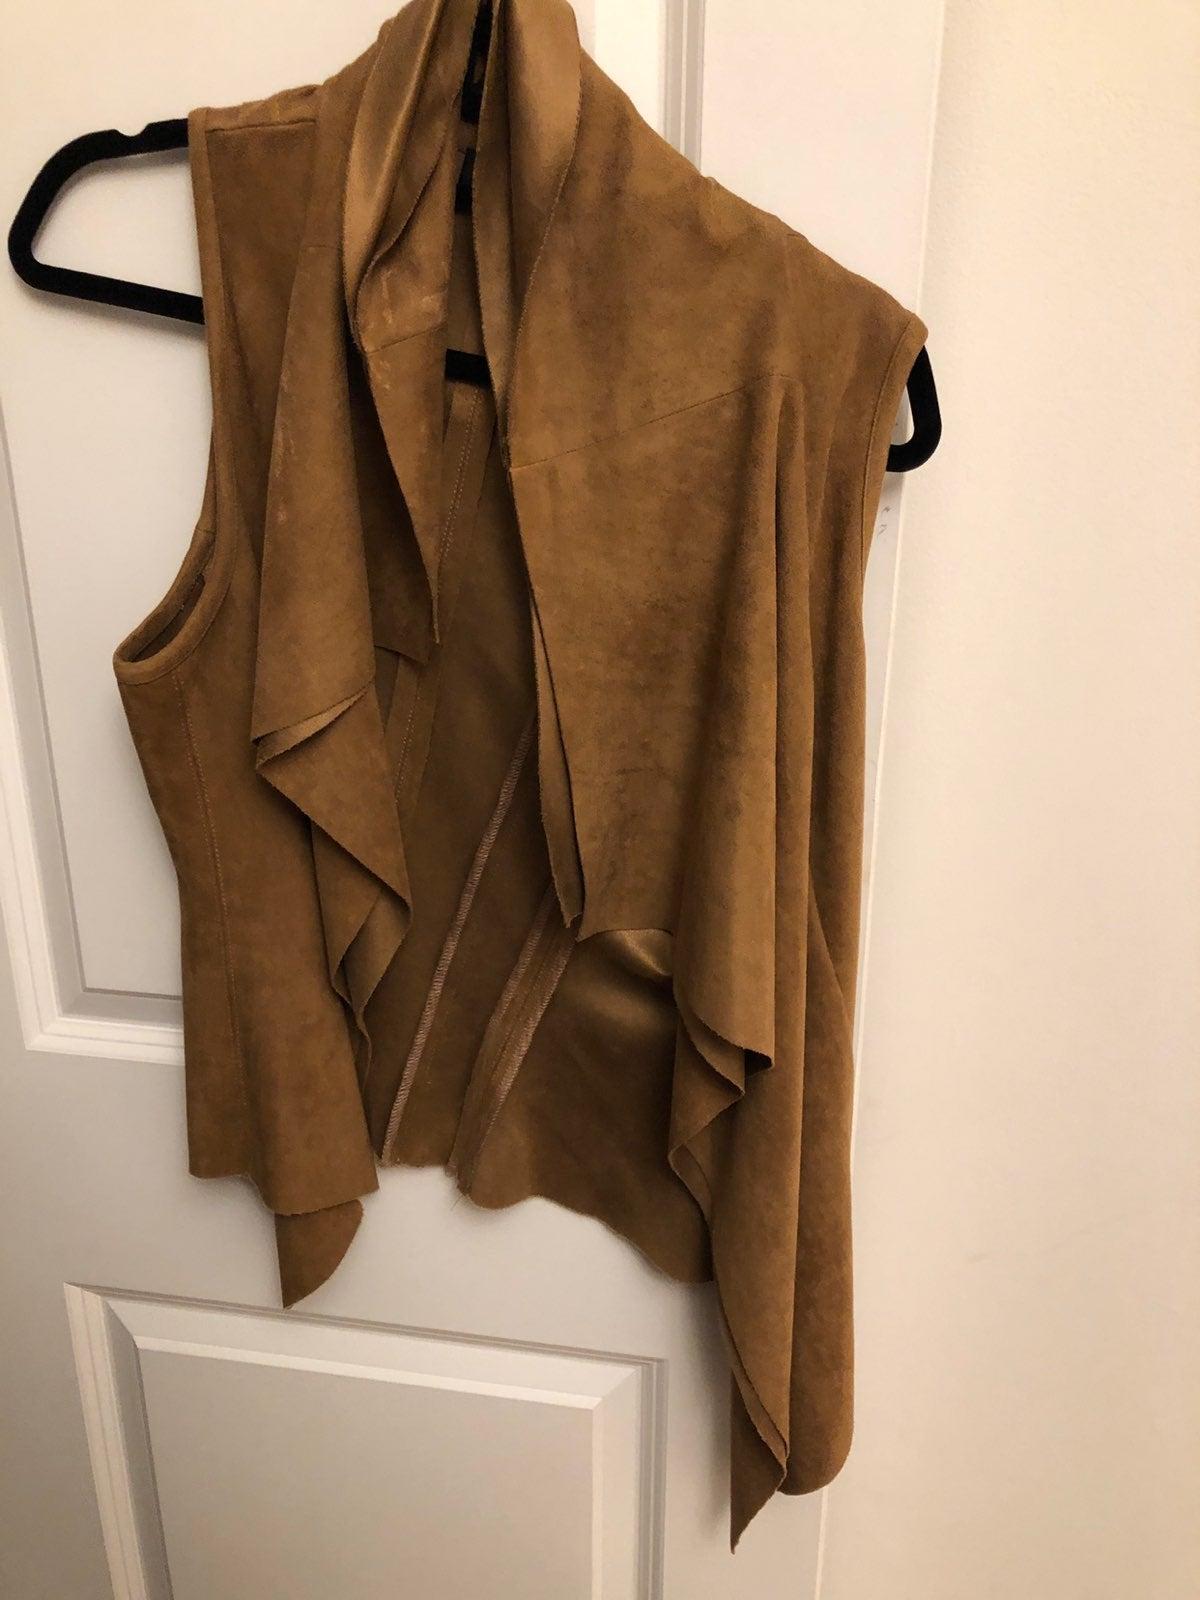 Karen Kane Brown Suede Vest Size XS